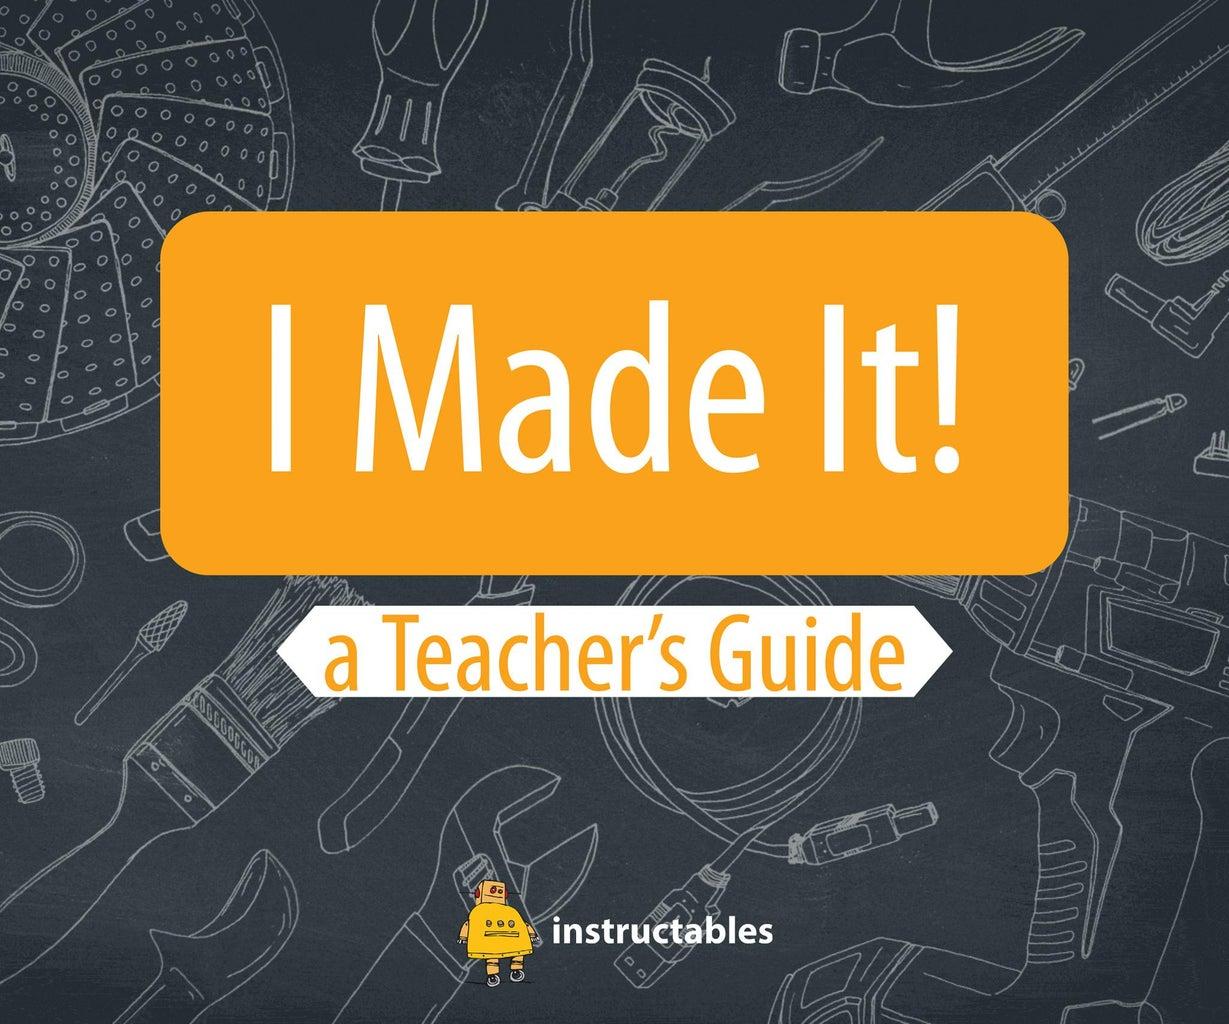 I Made It! a Teacher's Guide.